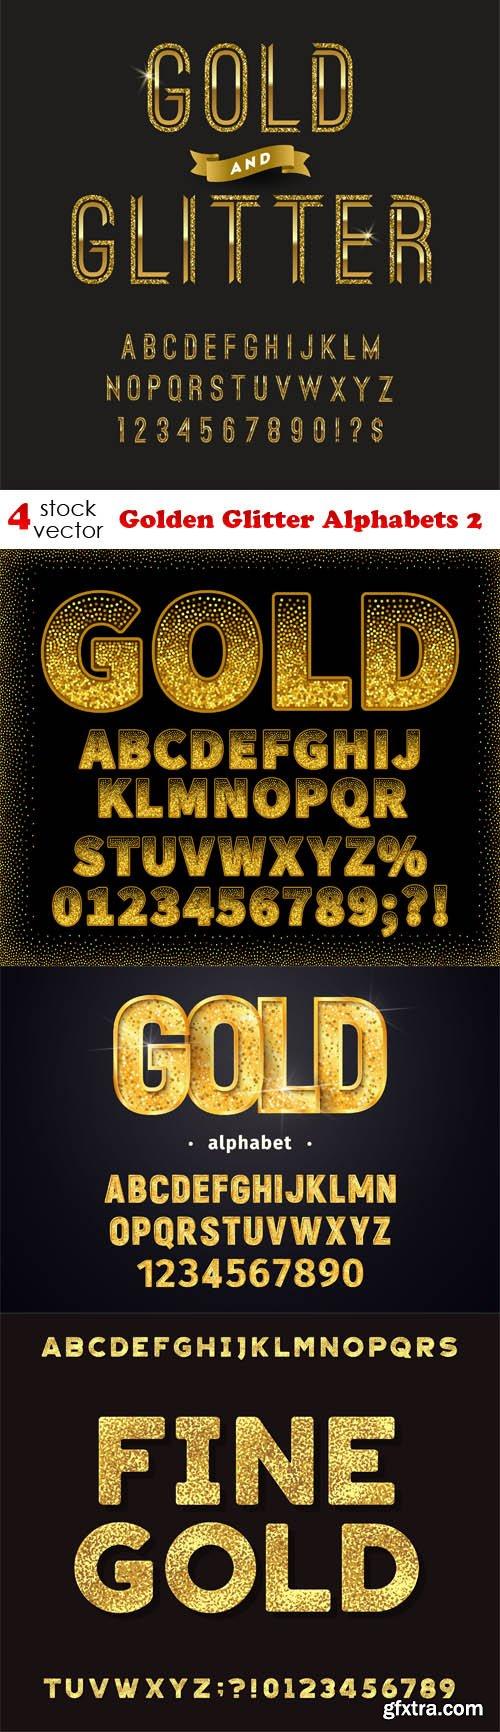 Vectors - Golden Glitter Alphabets 2